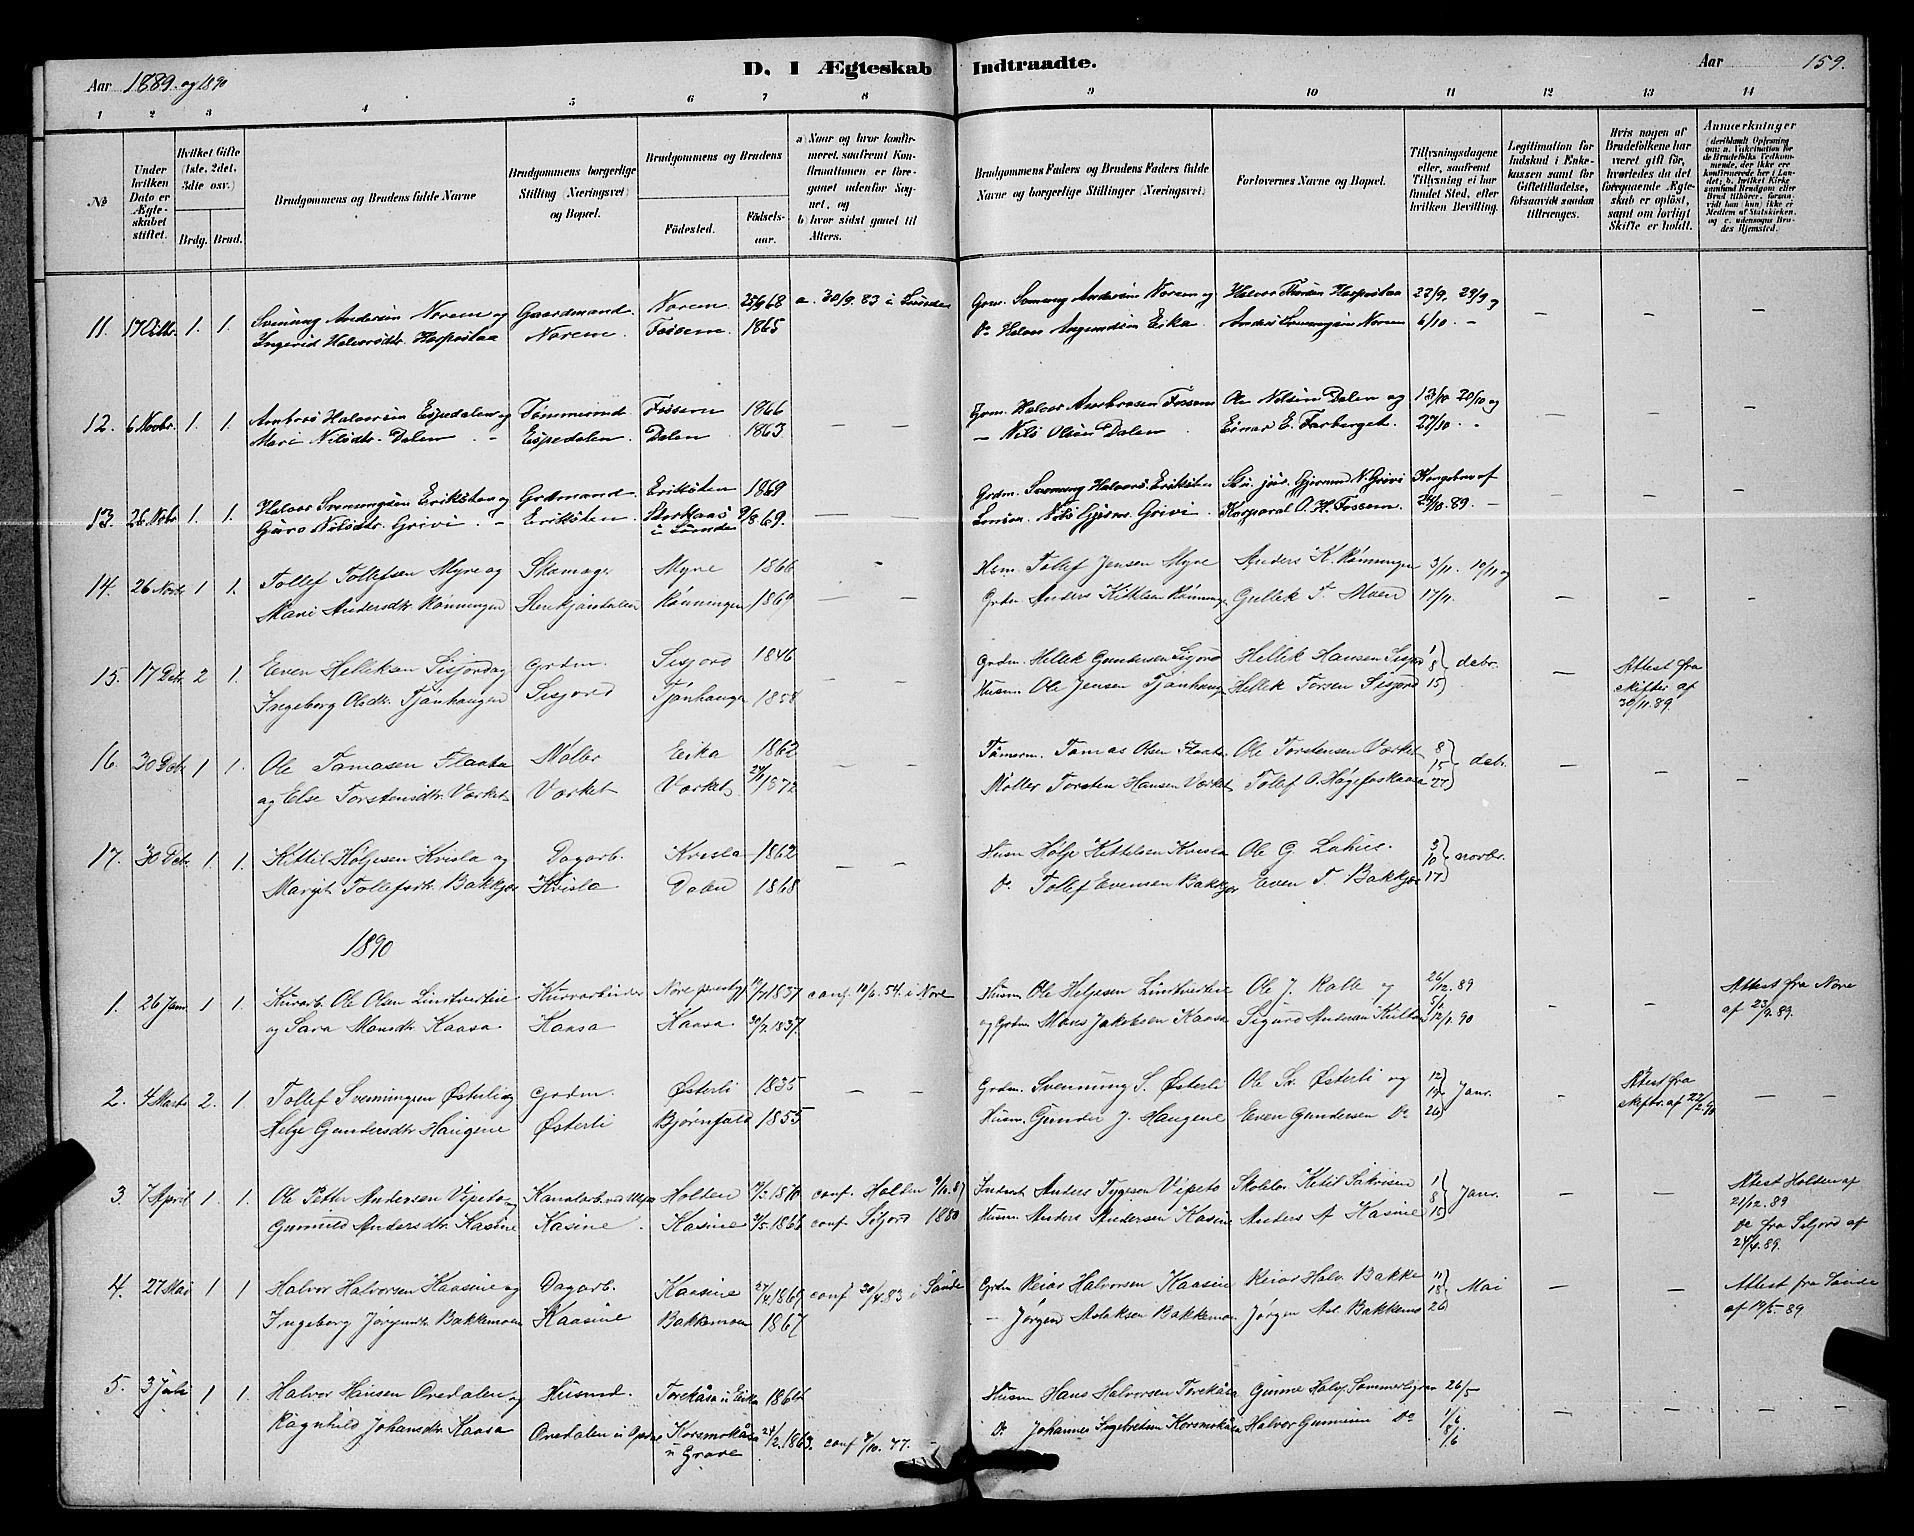 SAKO, Bø kirkebøker, G/Ga/L0005: Klokkerbok nr. 5, 1883-1897, s. 159